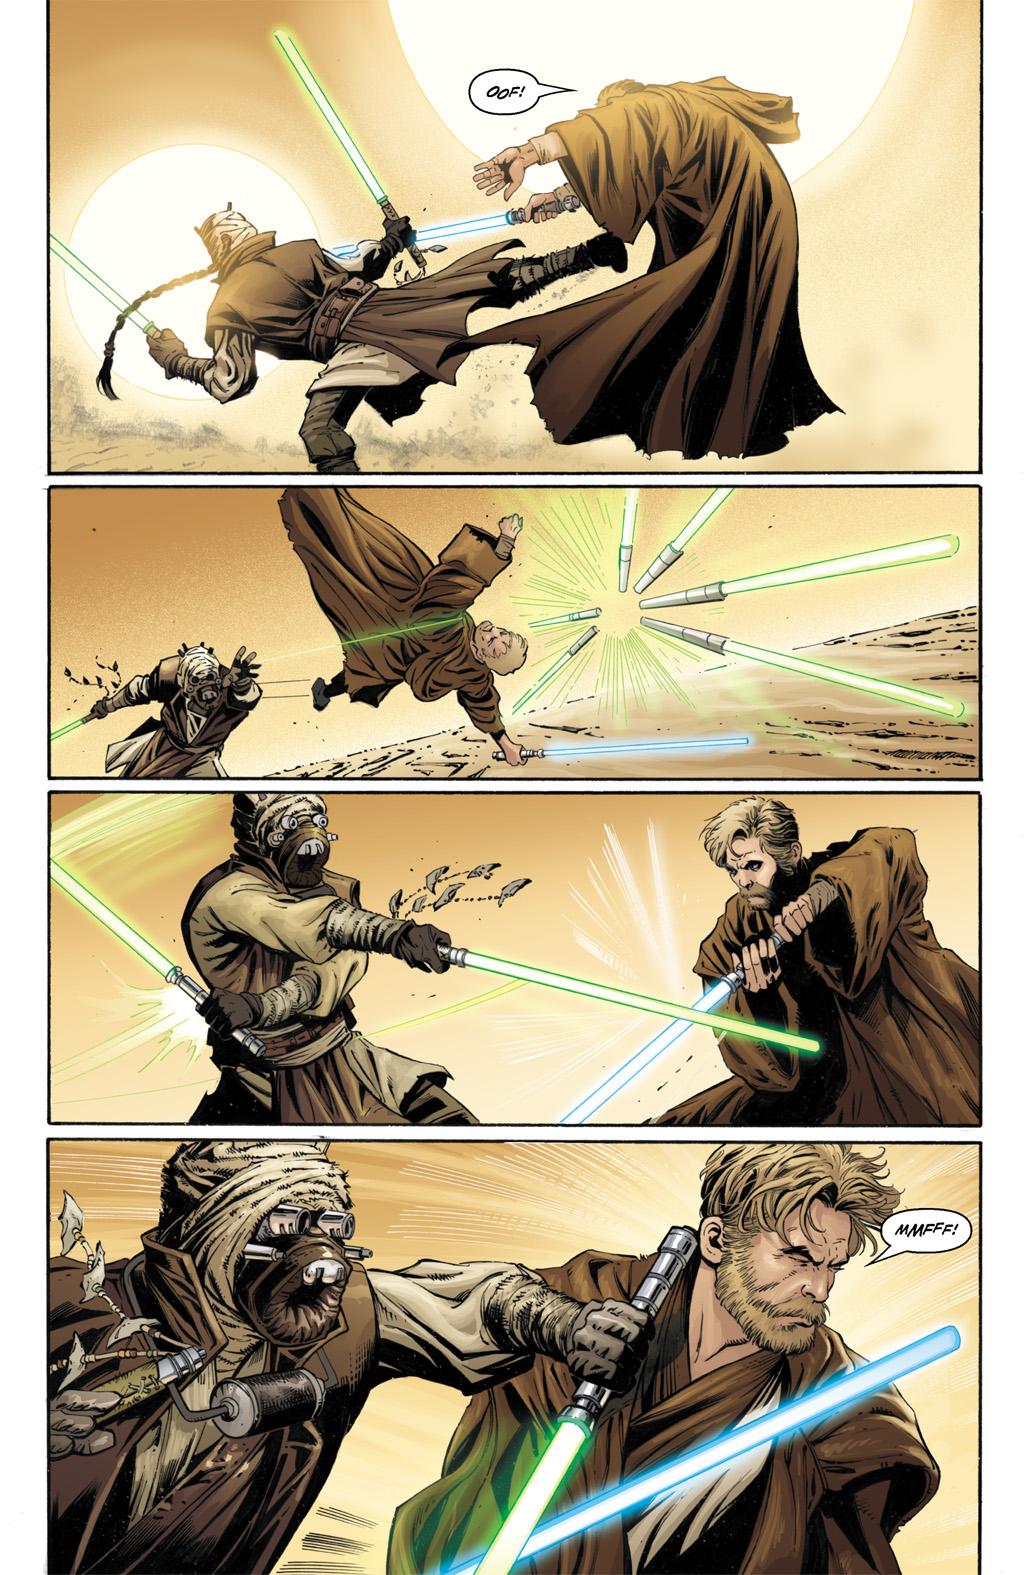 Comic-Only Fights Adapted To Novel Format UV-GqyuFQPde-7Zbq1Olvk7pBfSQRPWUPEpdp-ed0datTflcJ4ldh4MzDTuh5HL5_6nbCOBgZU8=s1600